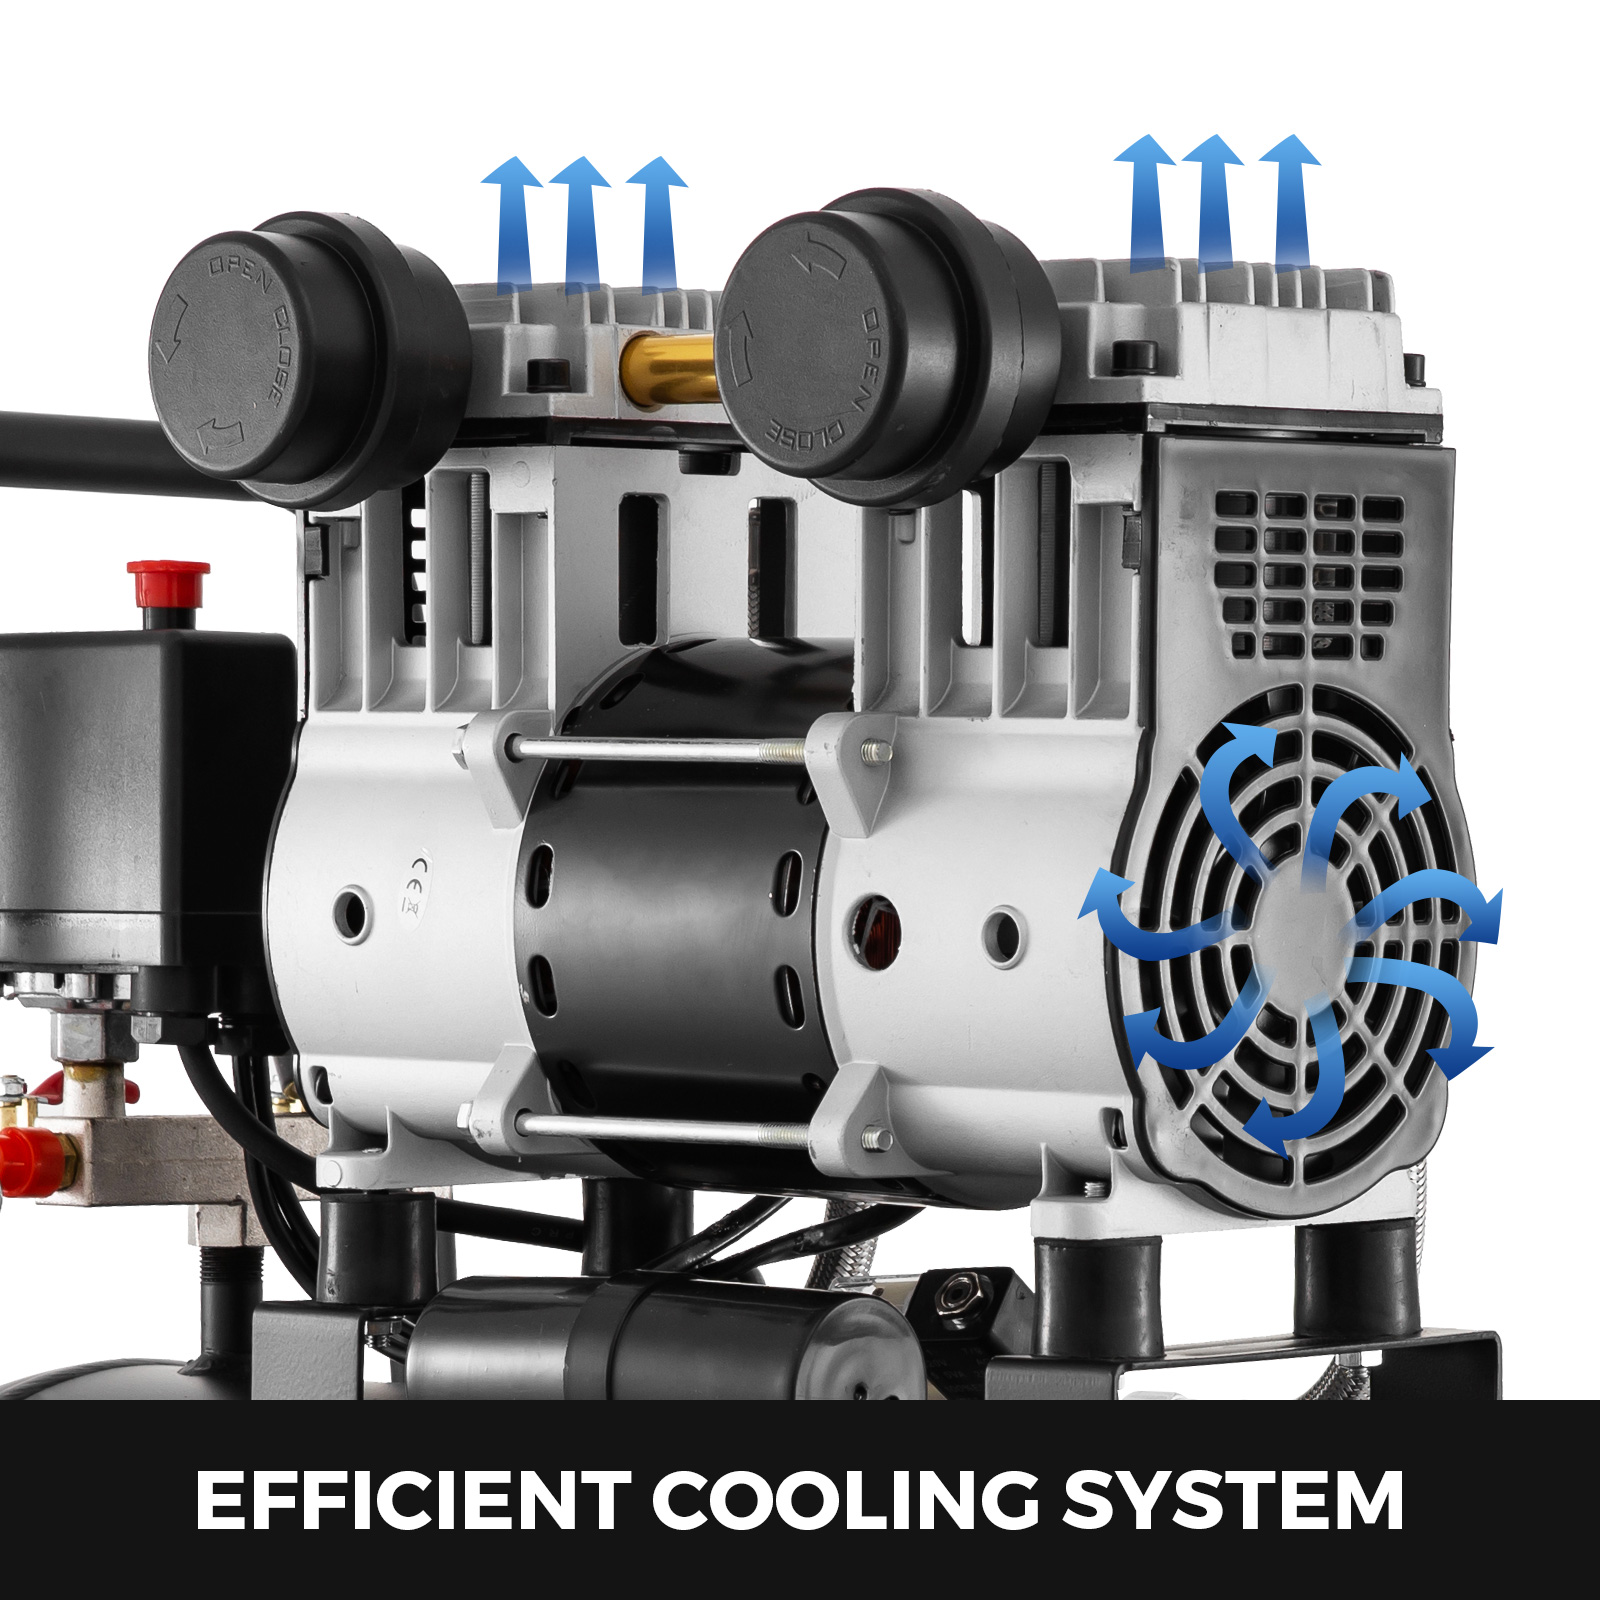 Vevor Flüster Kompressor Luftkompressor Silent 30L Airbrush 69dB 980W